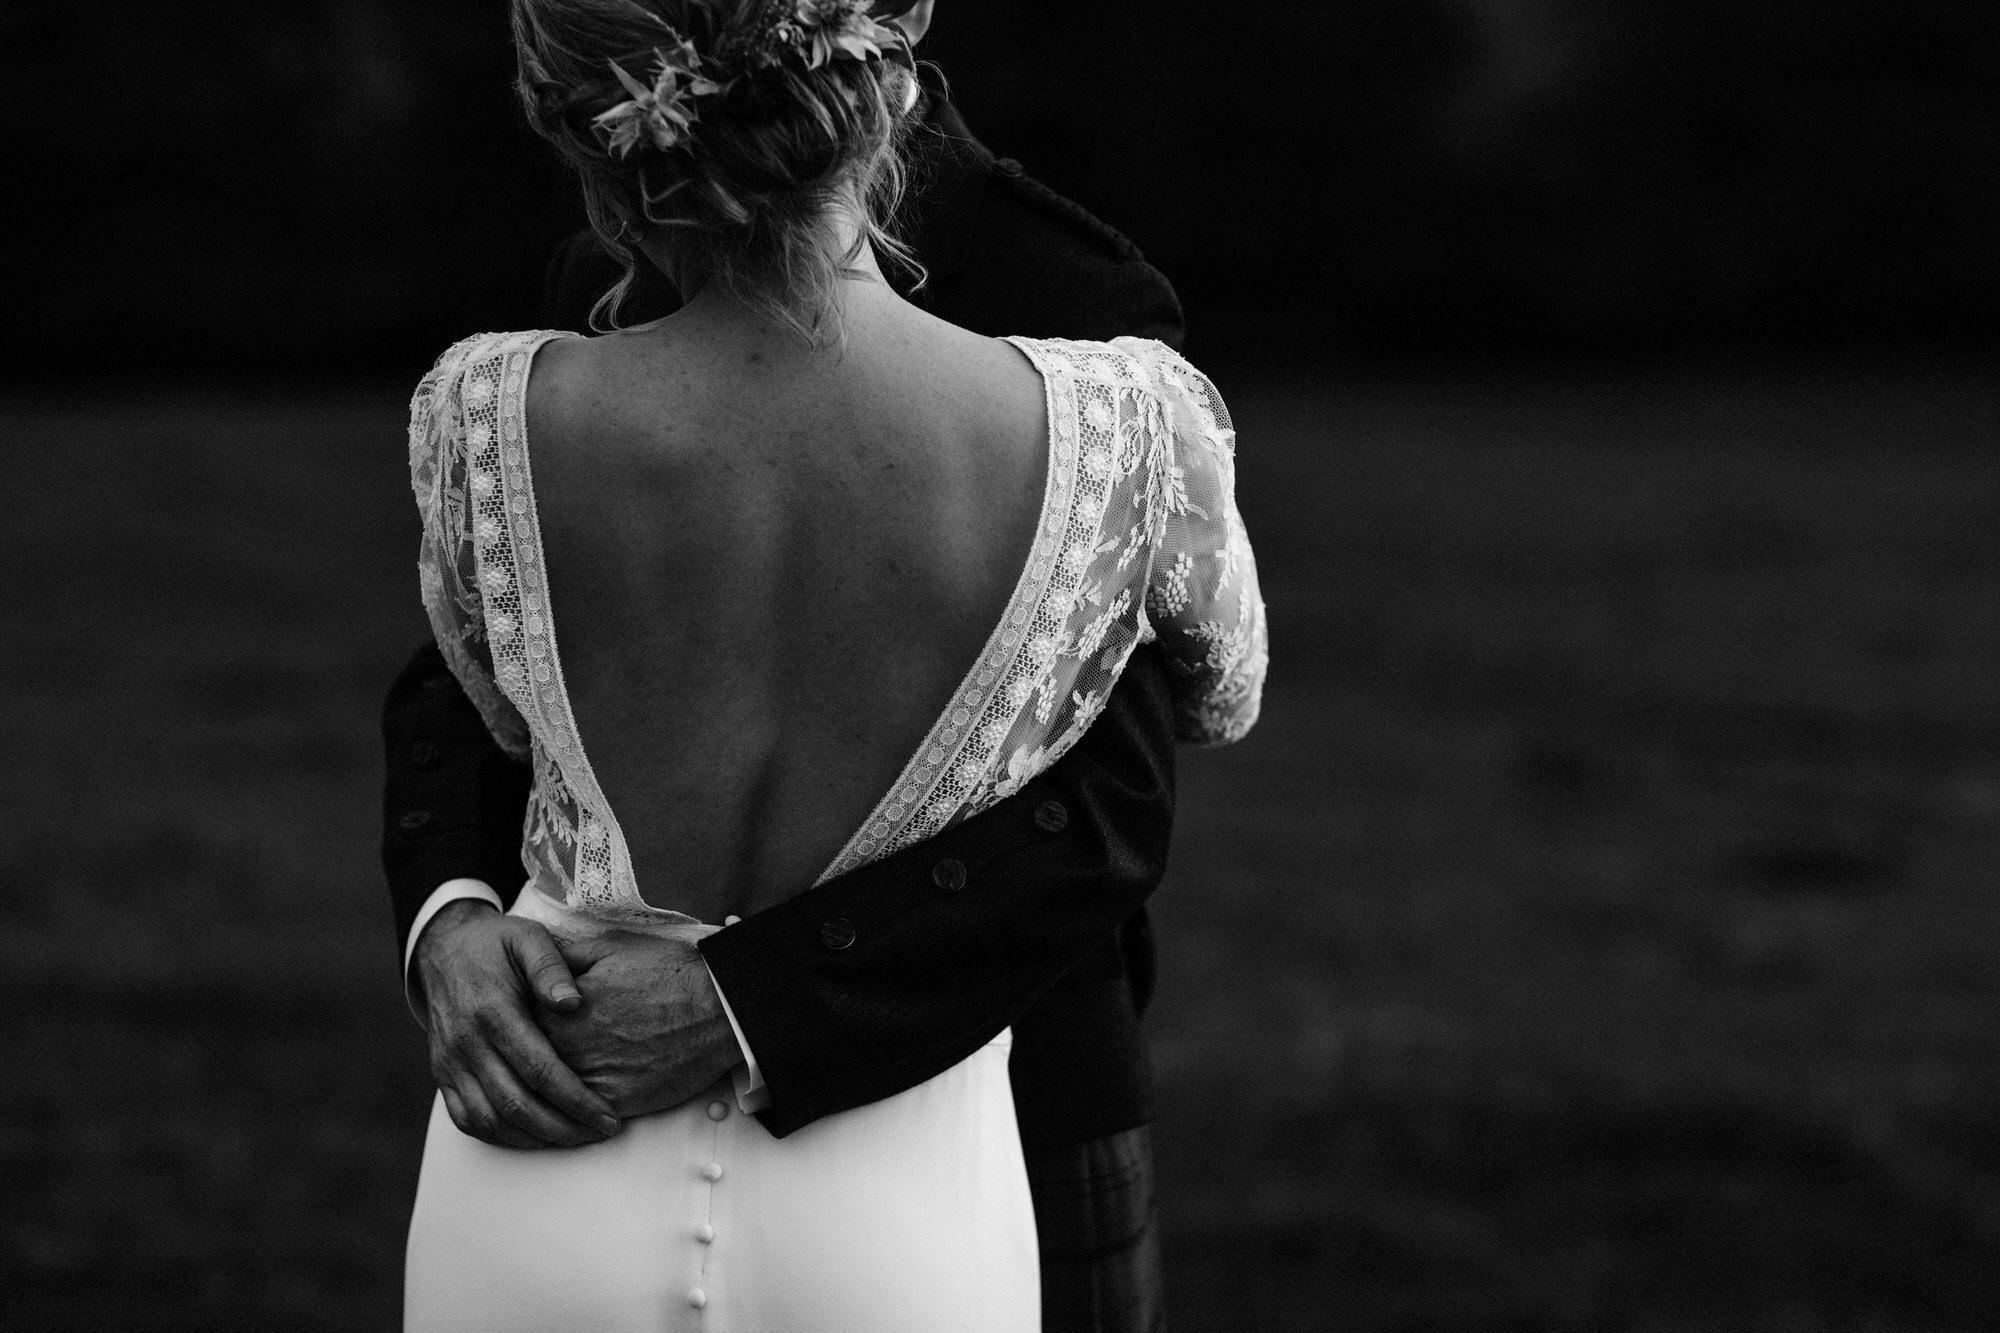 066 TIN SHED KNOCKRAICH WEDDING AUTUMN ZOE ALEXANDRA PHOTOGRAPHY